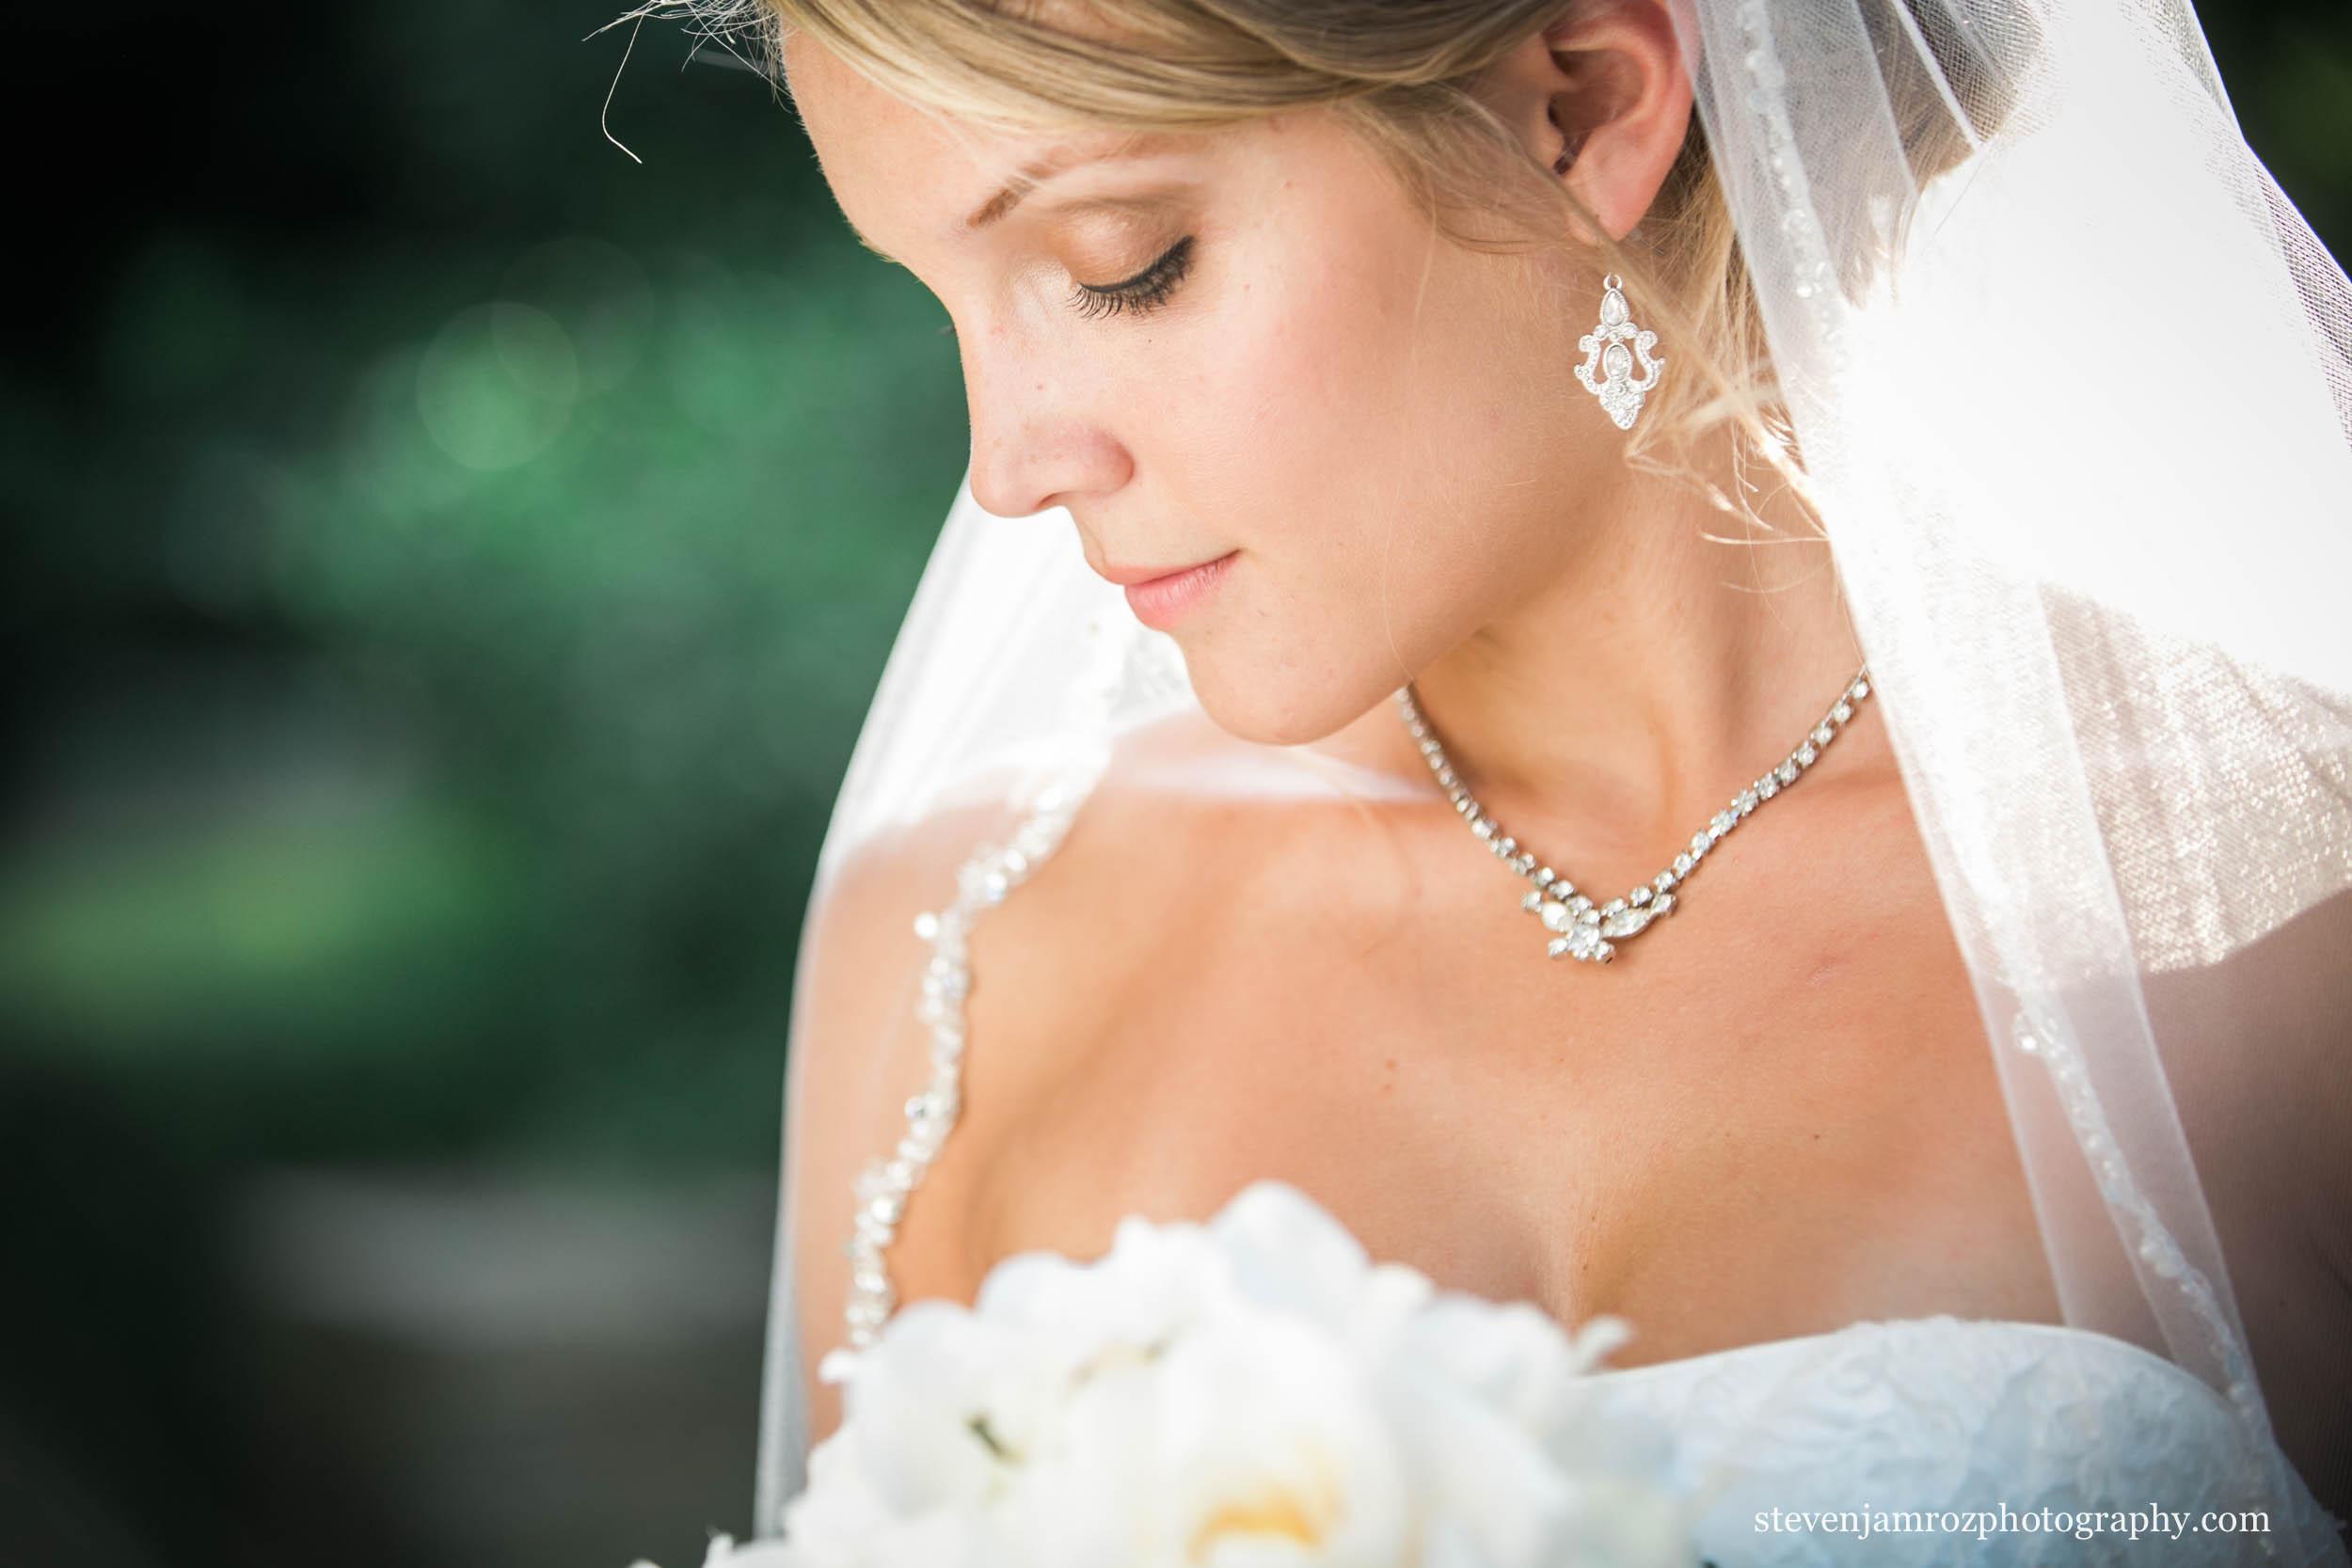 necklace-raleigh-jewlers-wedding-steven-jamroz-photography-0322.jpg